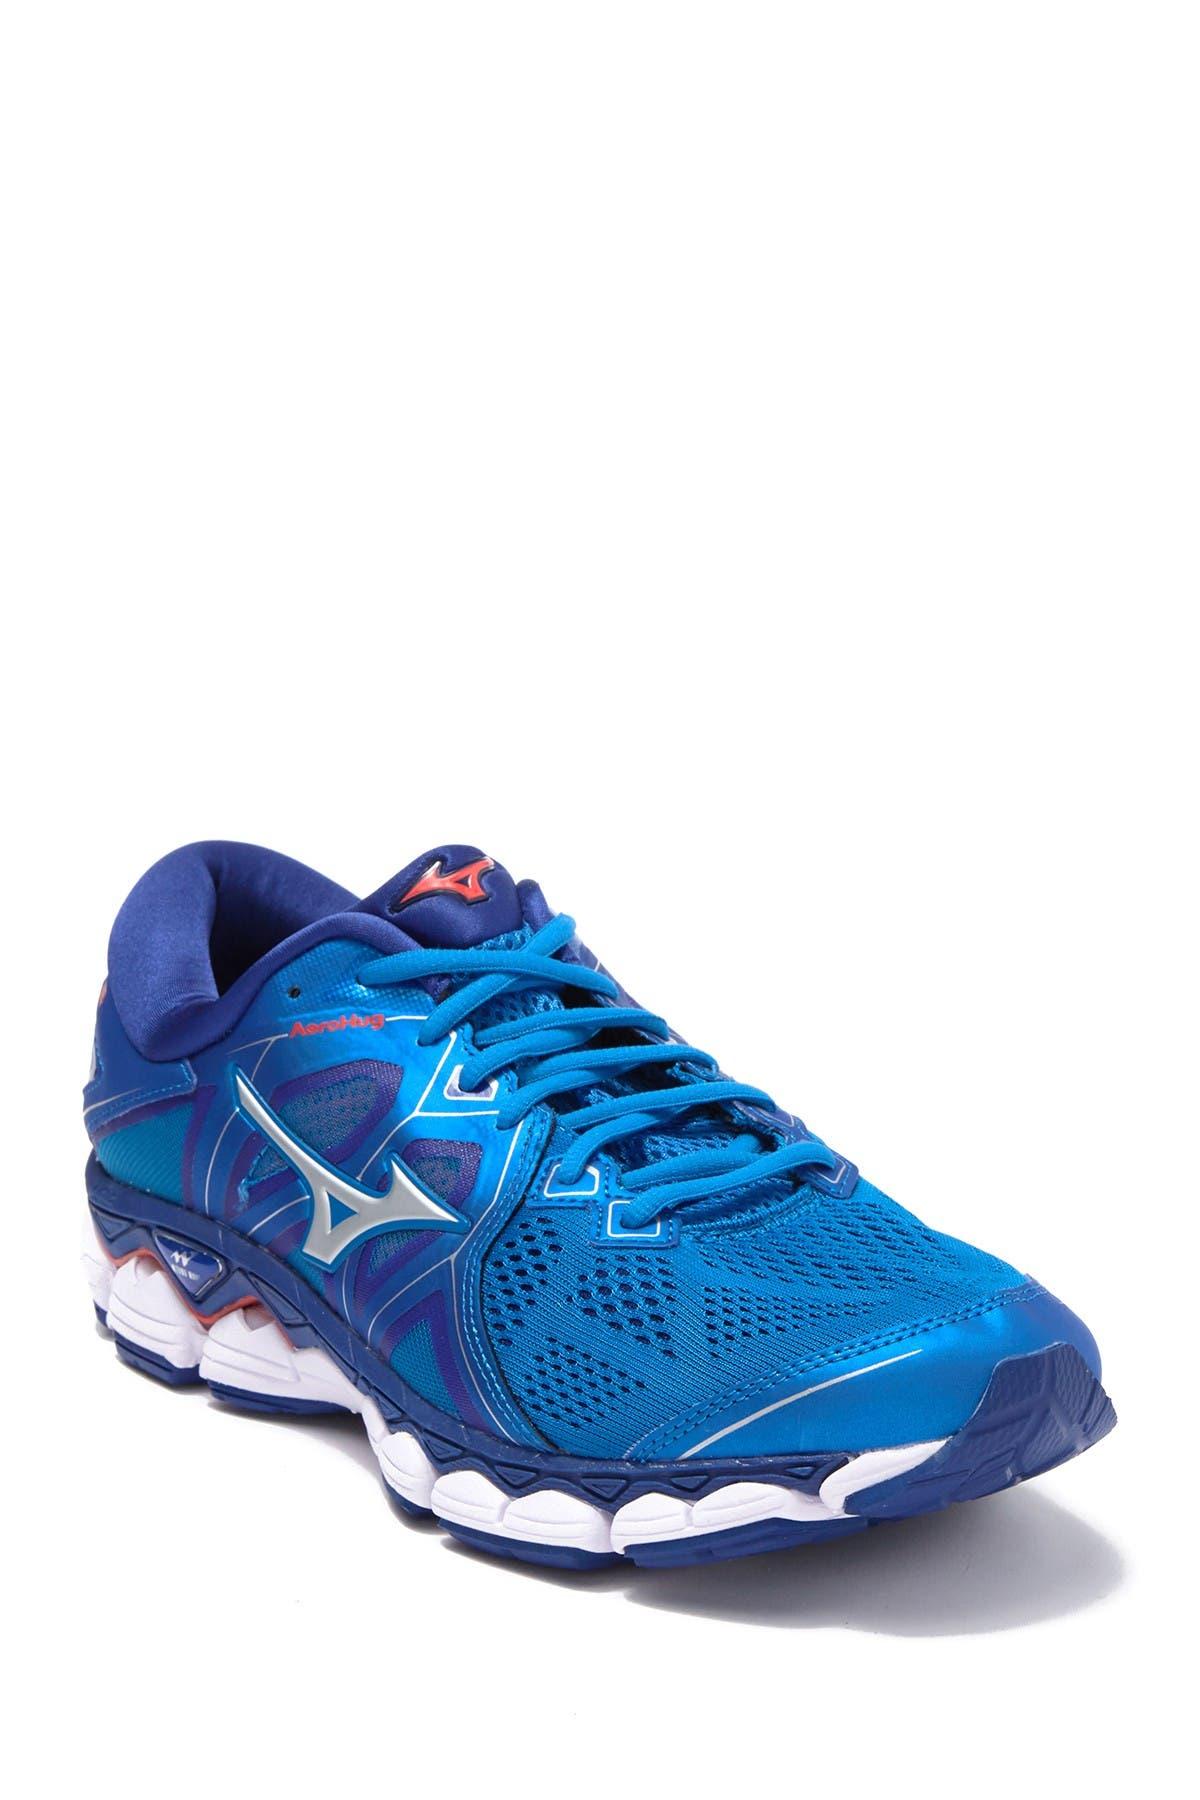 mizuno wave sky 2 running shoe - women's lacrosse